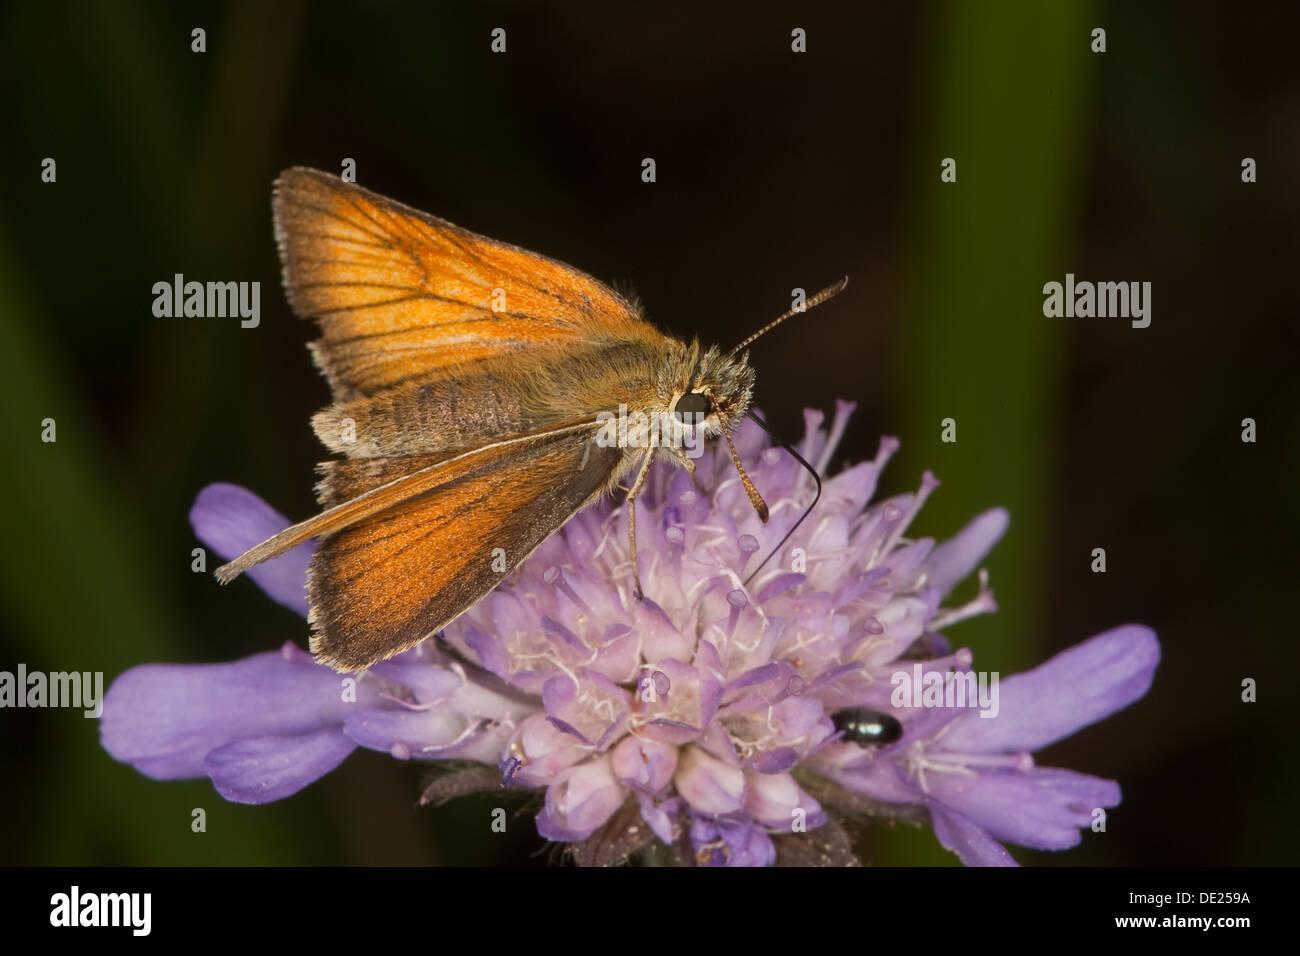 small skipper, Braunkolbiger Braundickkopffalter, Ockergelber Dickkopffalter, Thymelicus sylvestris, Hesperidae, Stock Photo